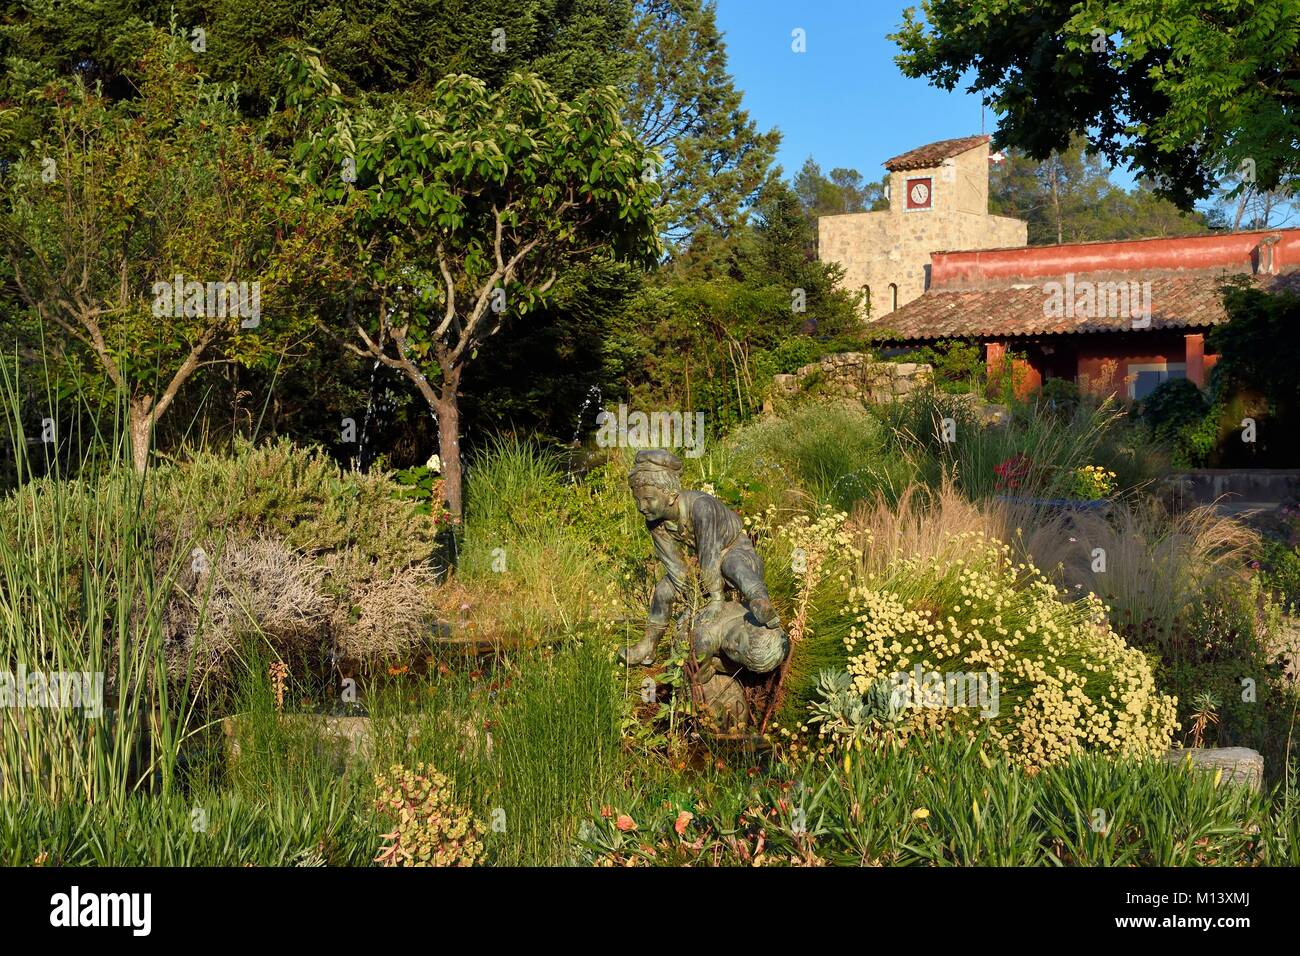 France, Var, Provence Verte (Green Provence), Bras village next to Saint Maximin, Le Peyrourier - une campagne en - Stock Image